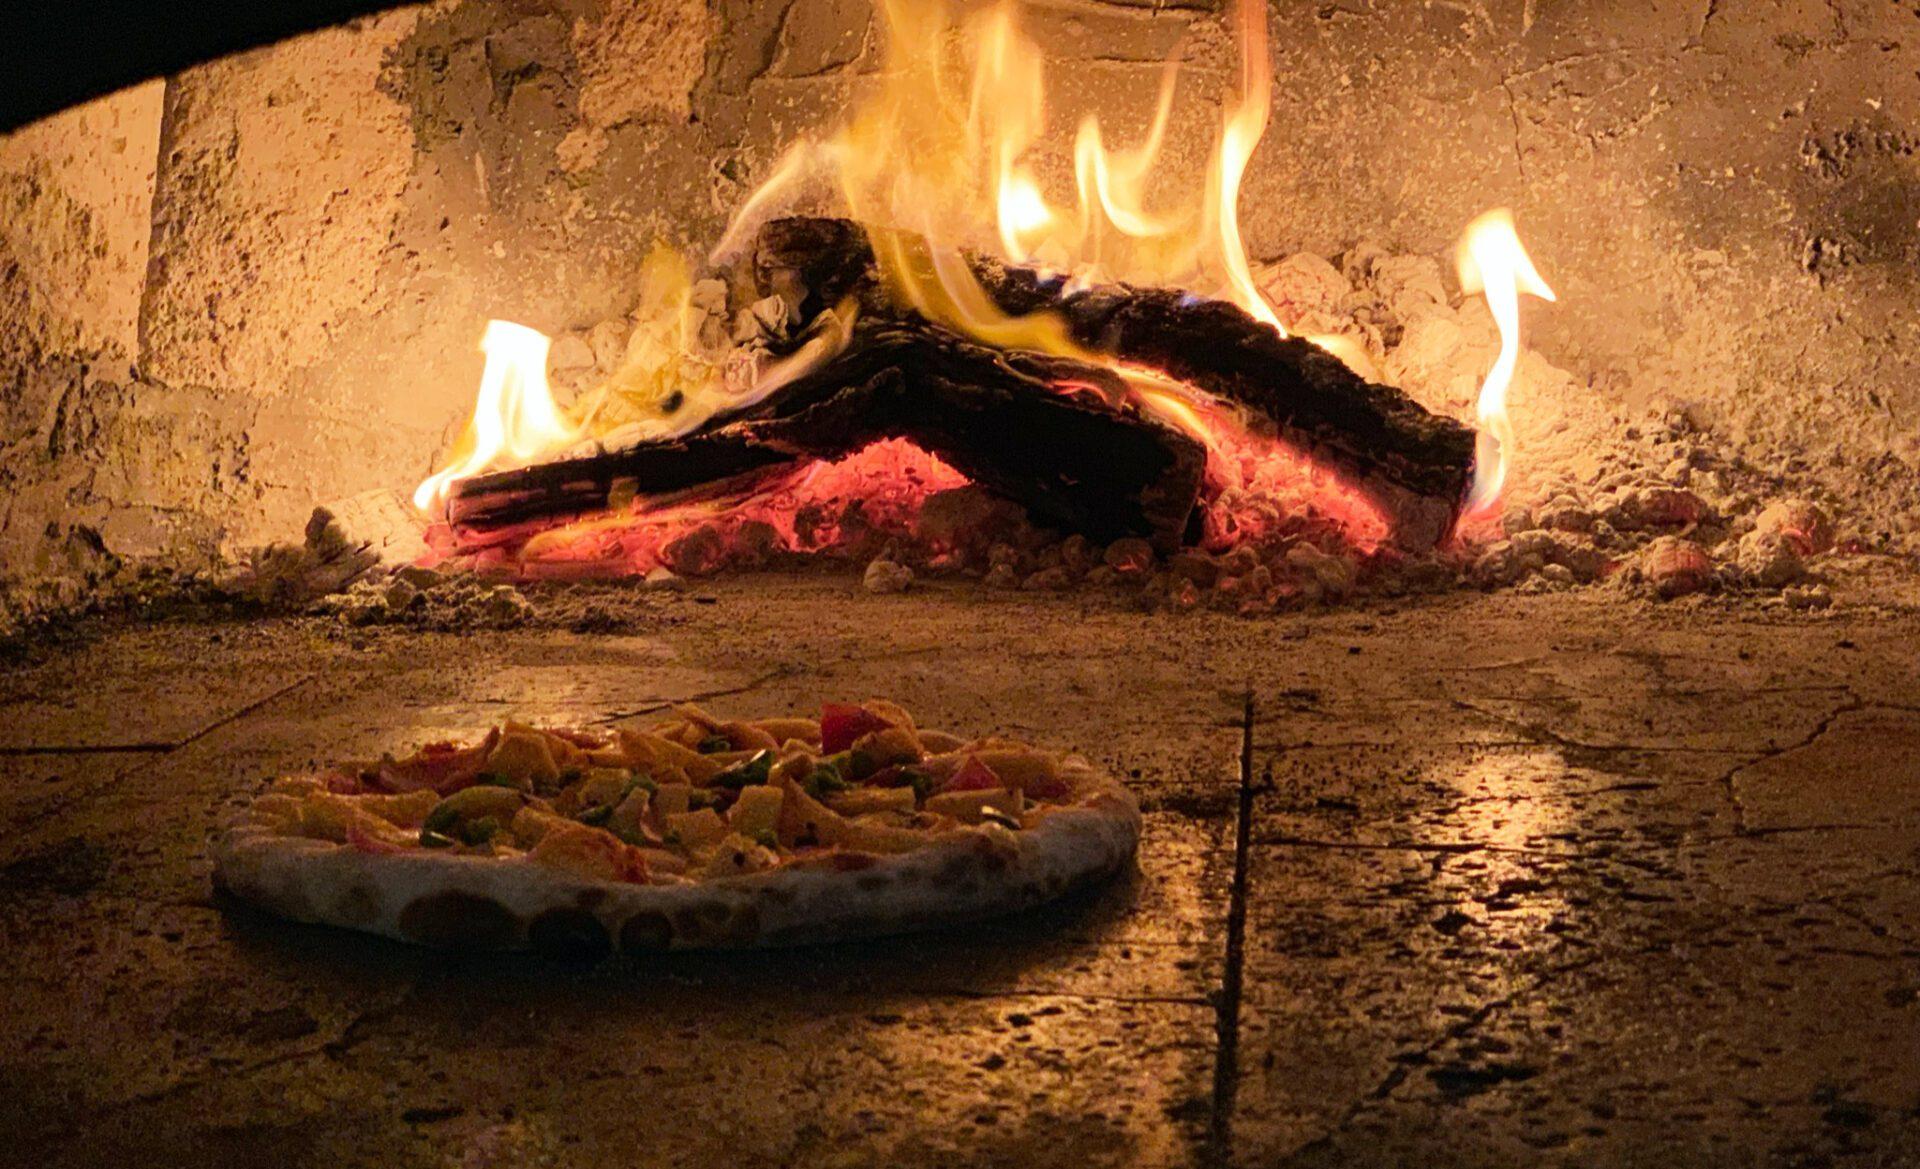 kaiser grille pizza oven